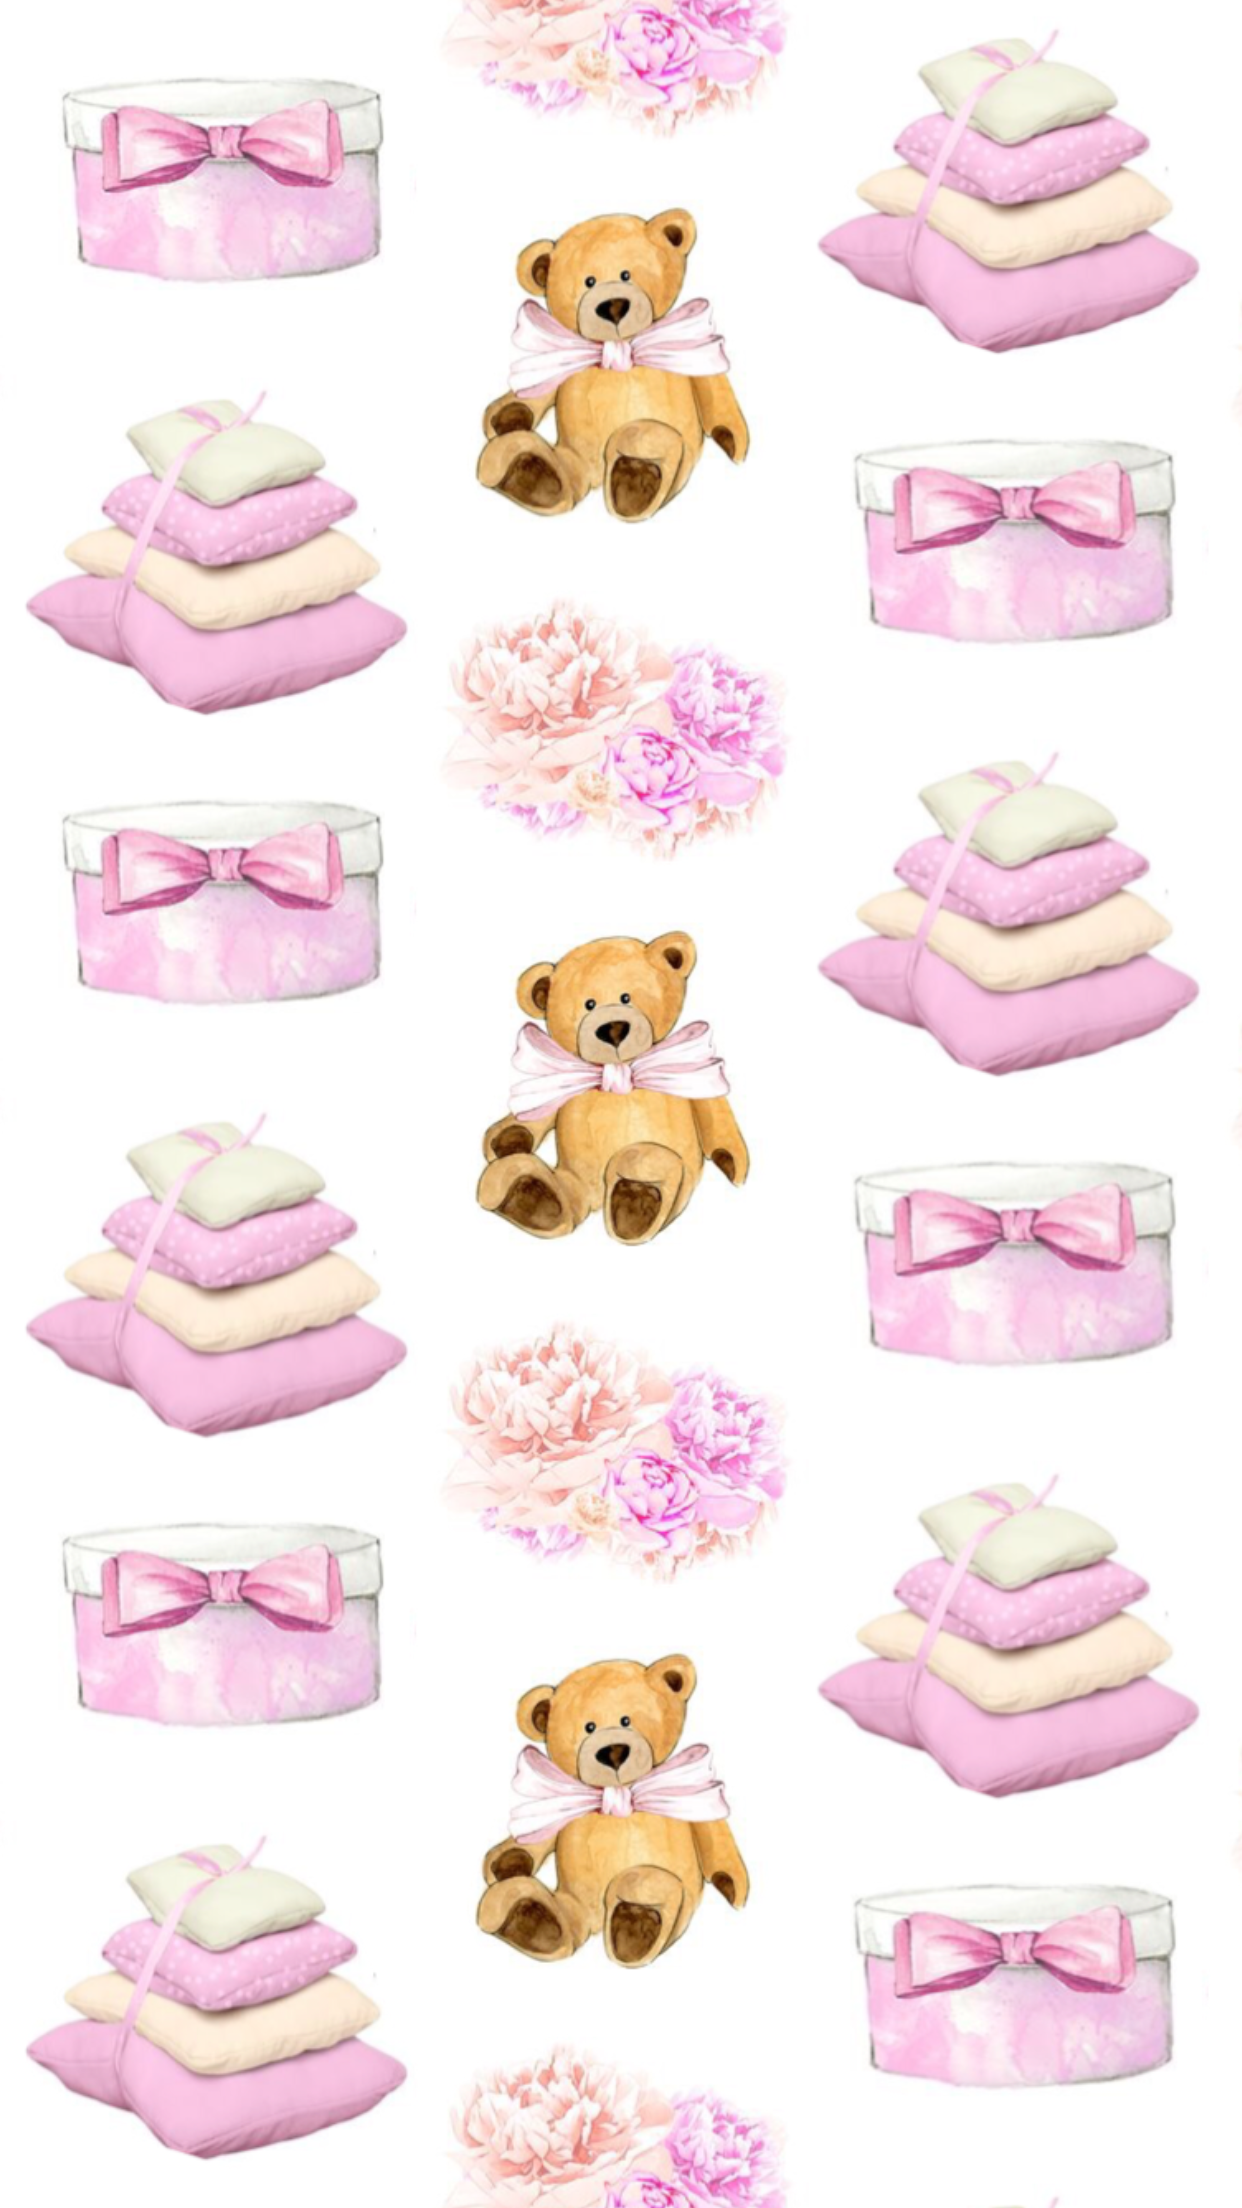 Cute Wallpapers 3 おしゃれまとめの人気アイデア Pinterest Terri